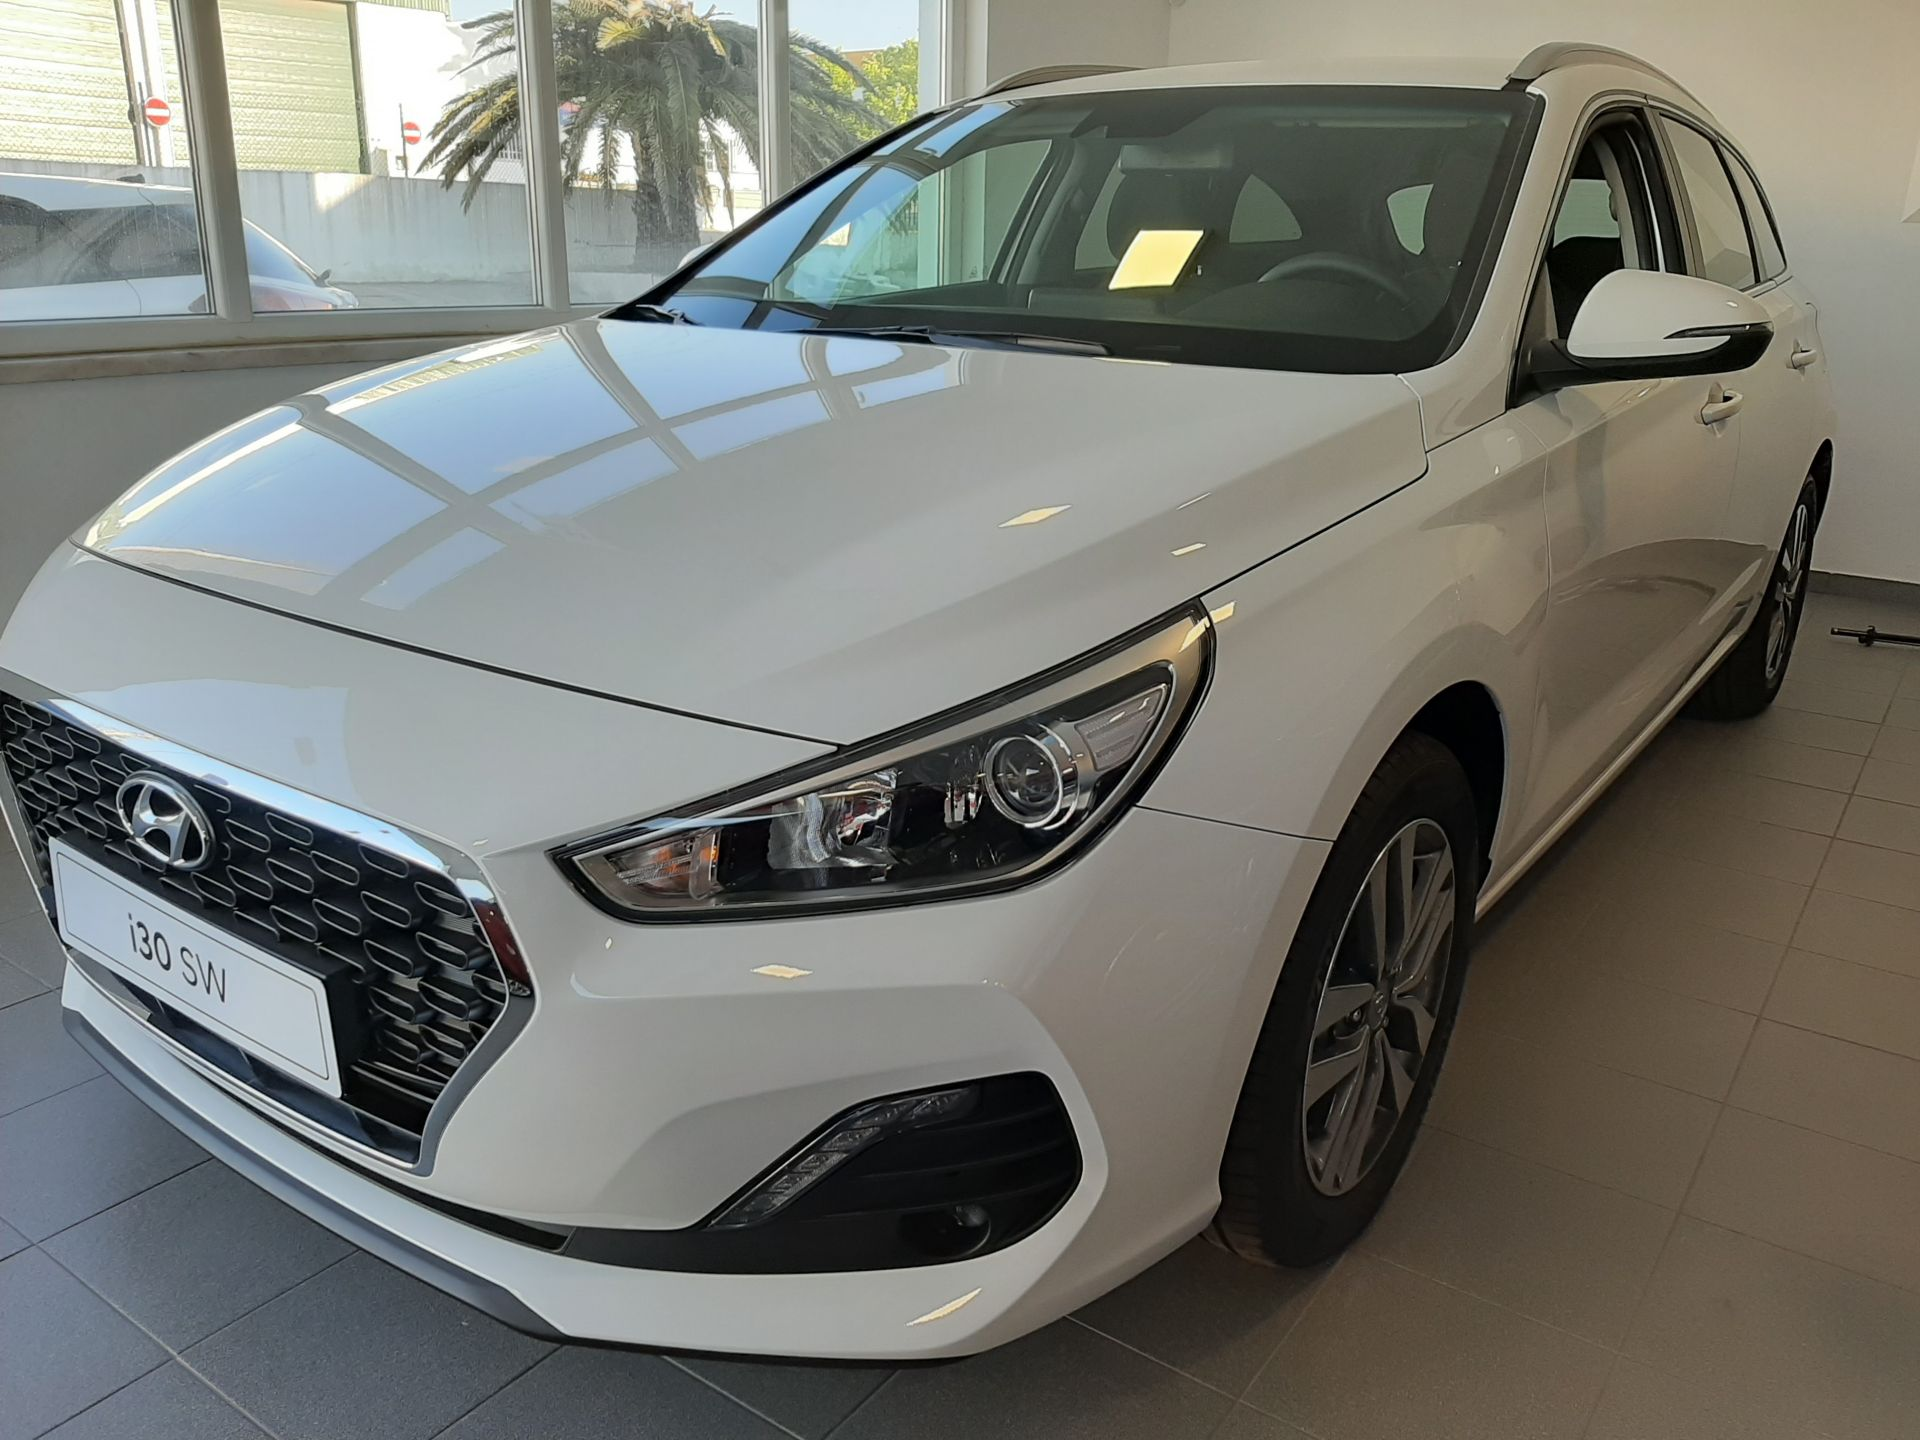 Hyundai i30 SW 1.6 CRDi 116cv Style + Navi MY195 segunda mão Setúbal